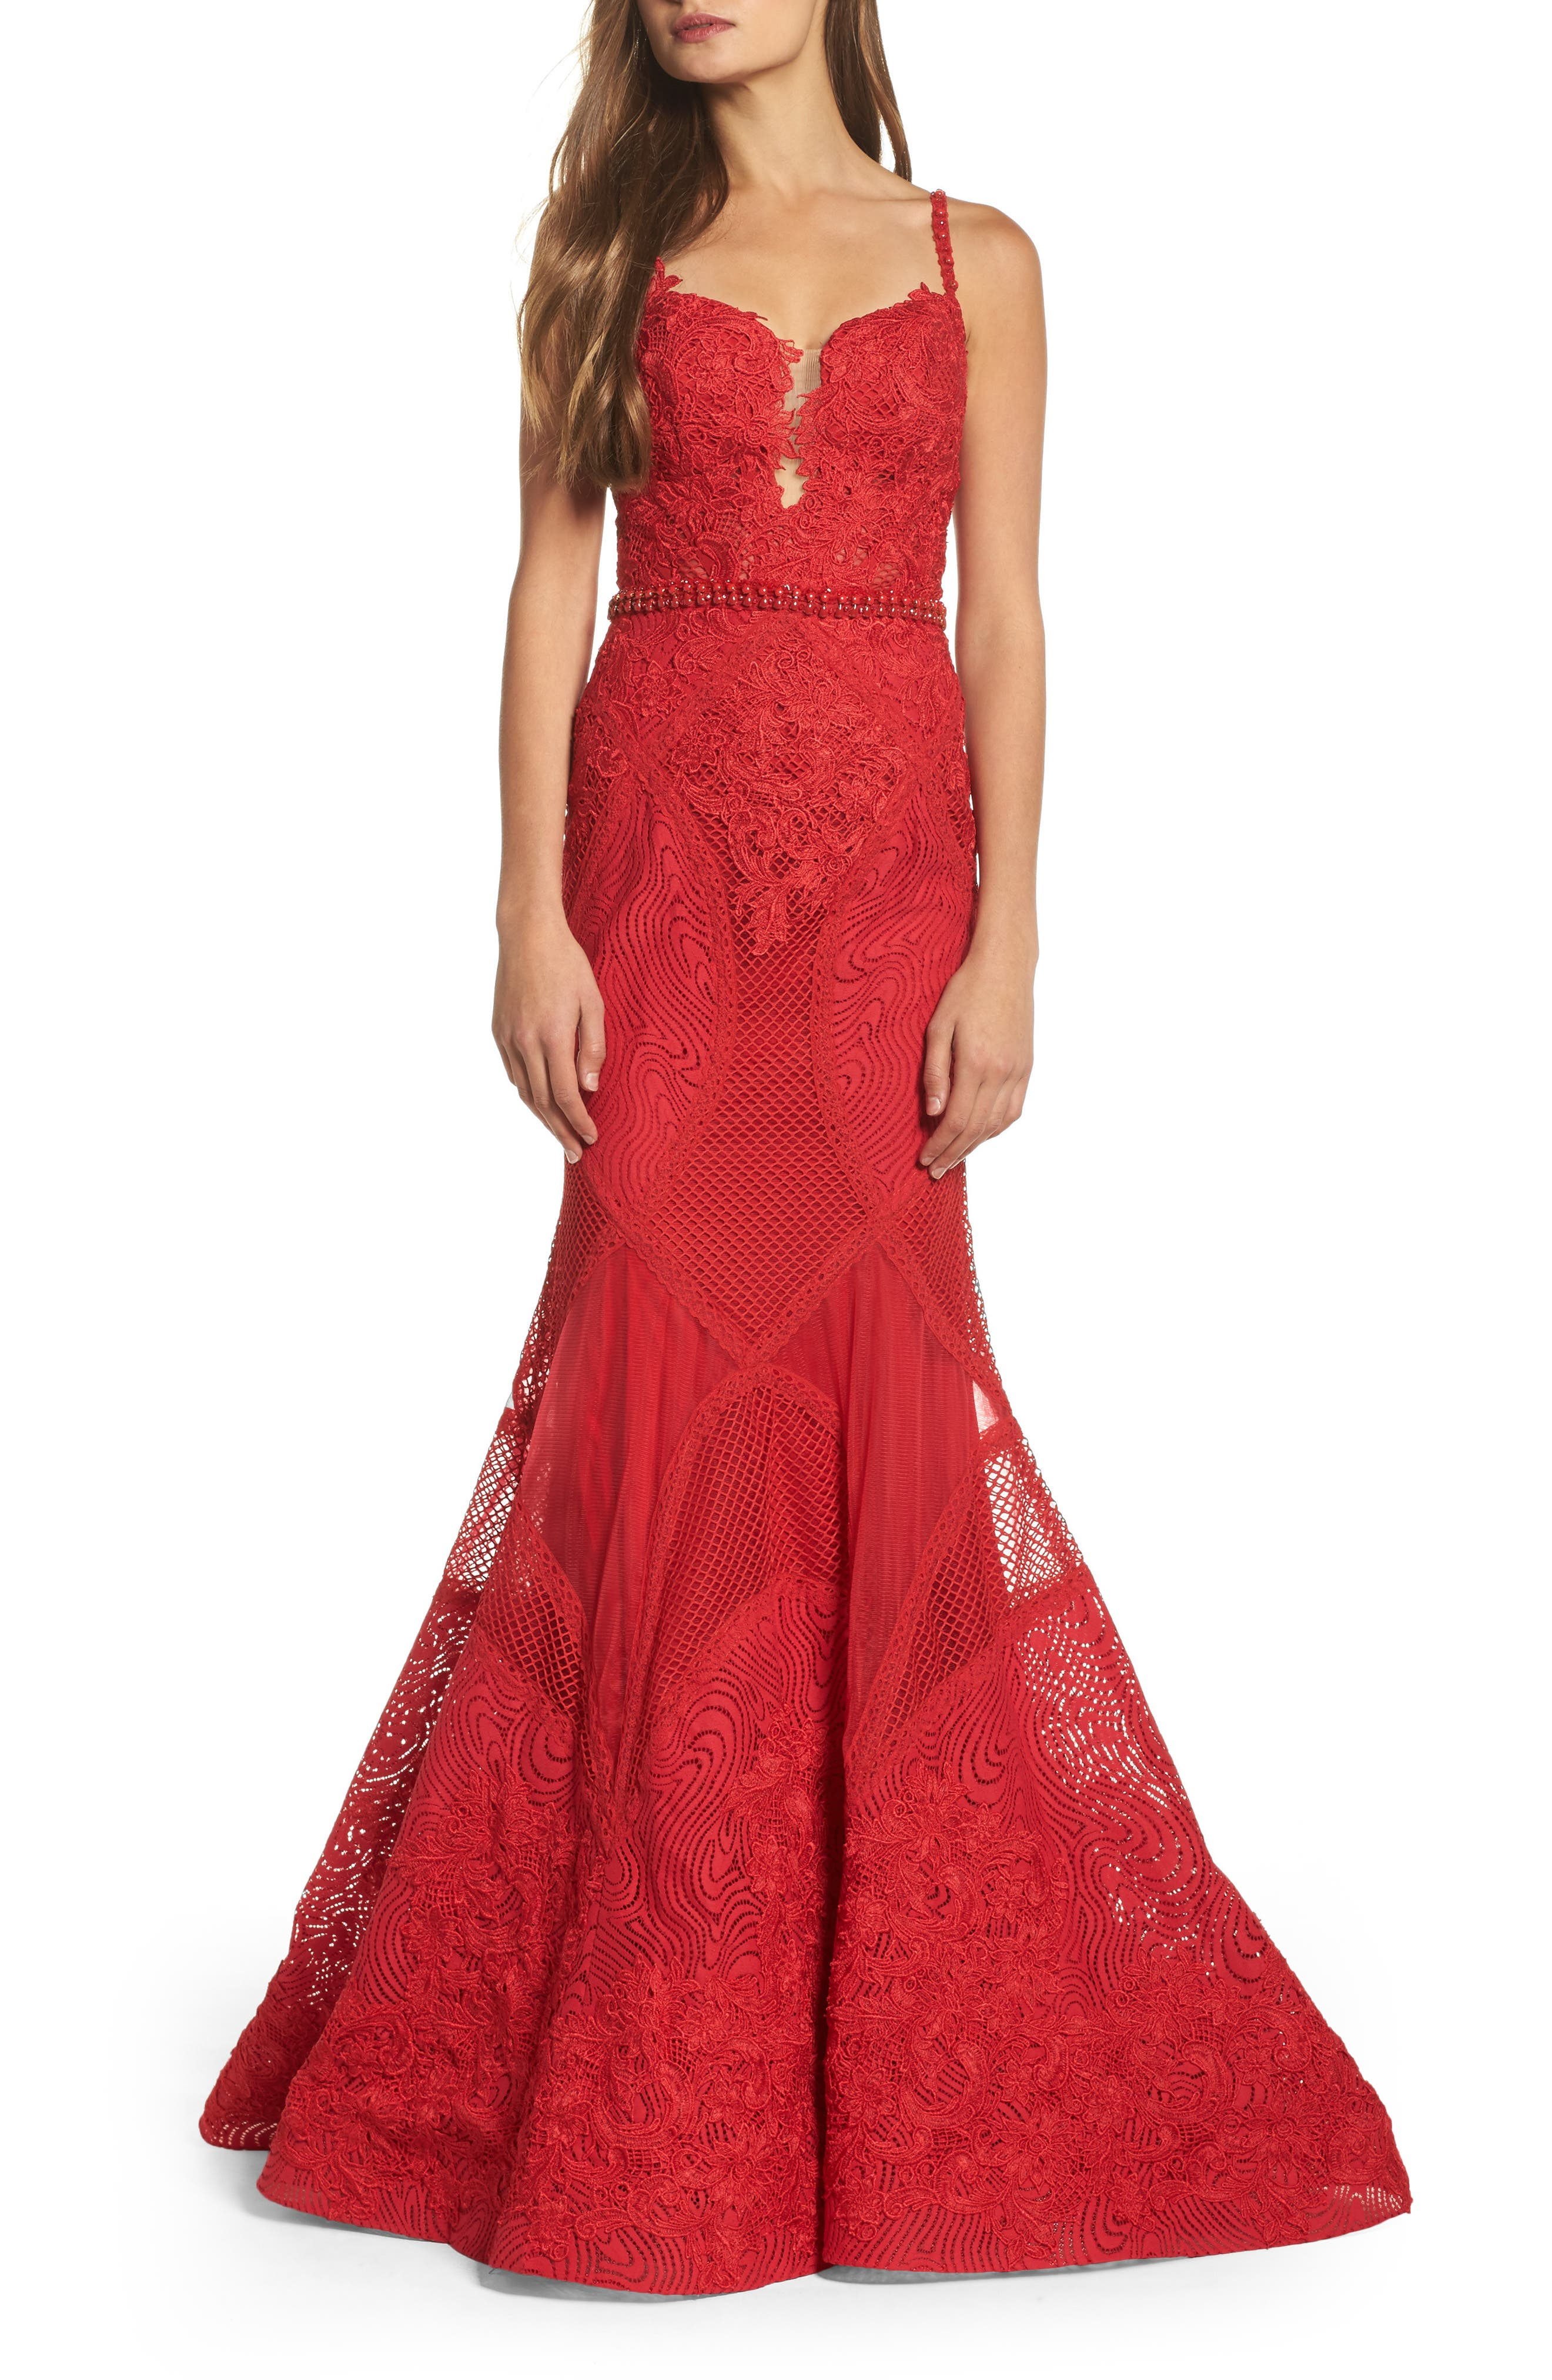 Main Image - Mac Duggal Embellished Lace Mermaid Gown